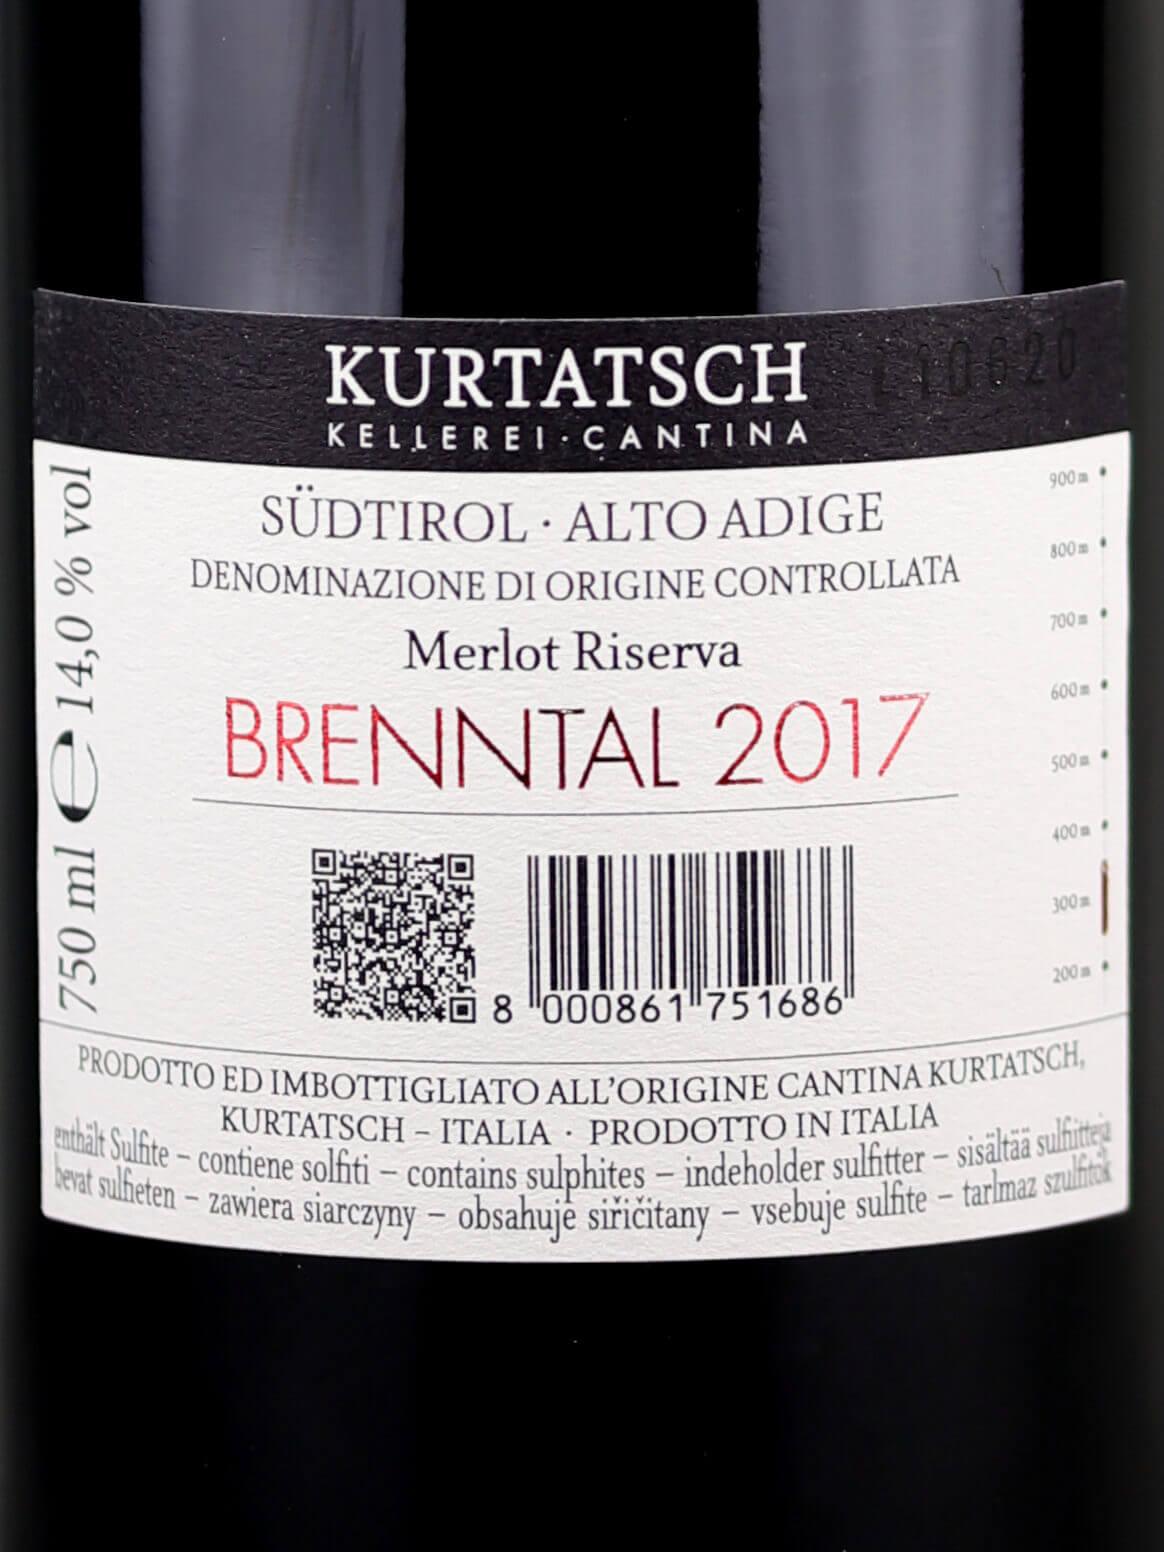 Back label of Kurtatsch Brenntal Merlot Riserva 2017 Alto Adige DOC